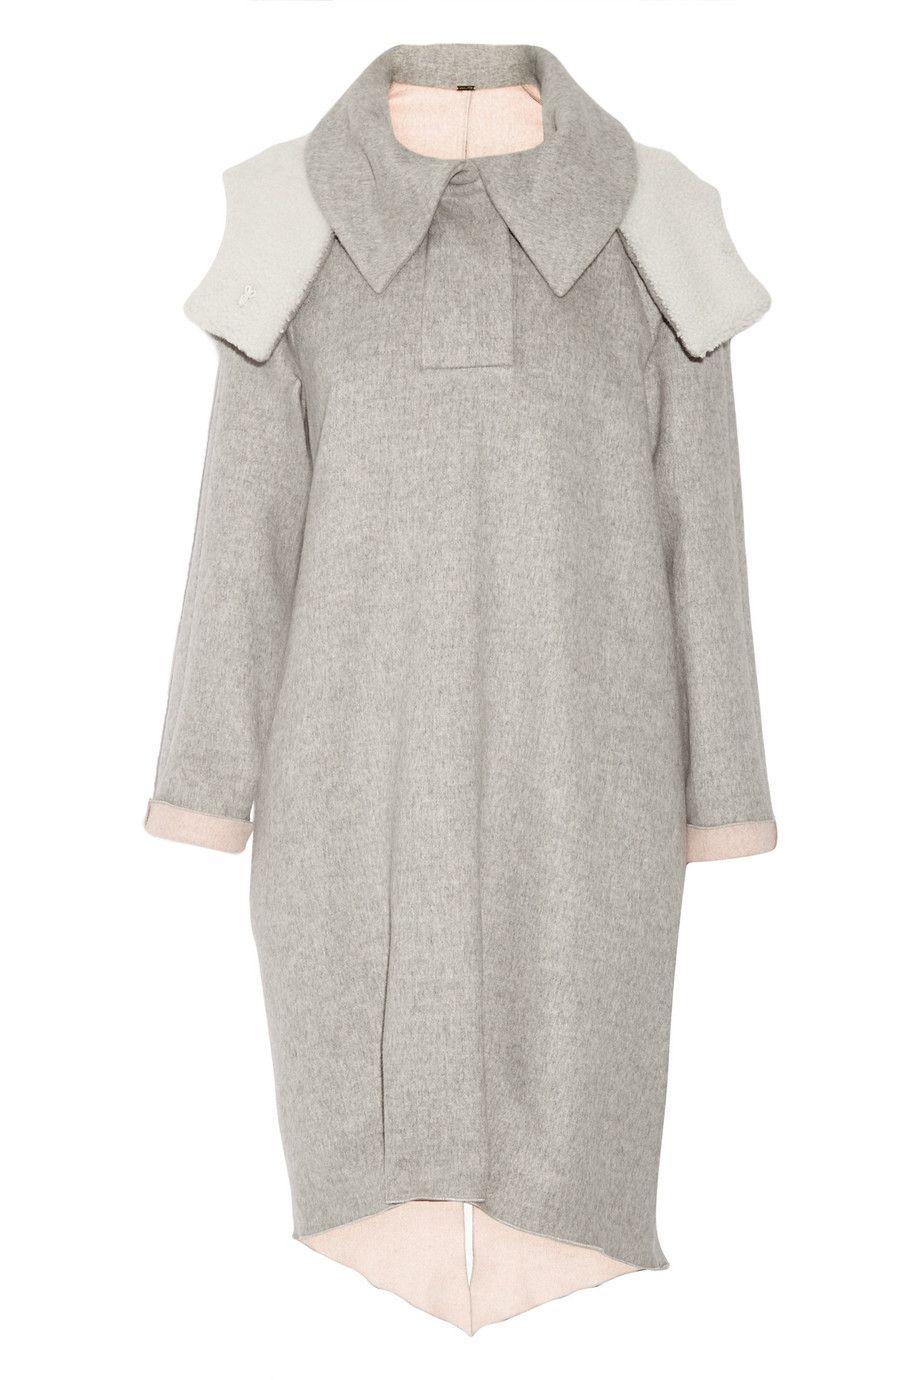 ADAM LIPPES Shearling-Trimmed Wool And Angora-Blend Coat. #adamlippes #cloth #coat